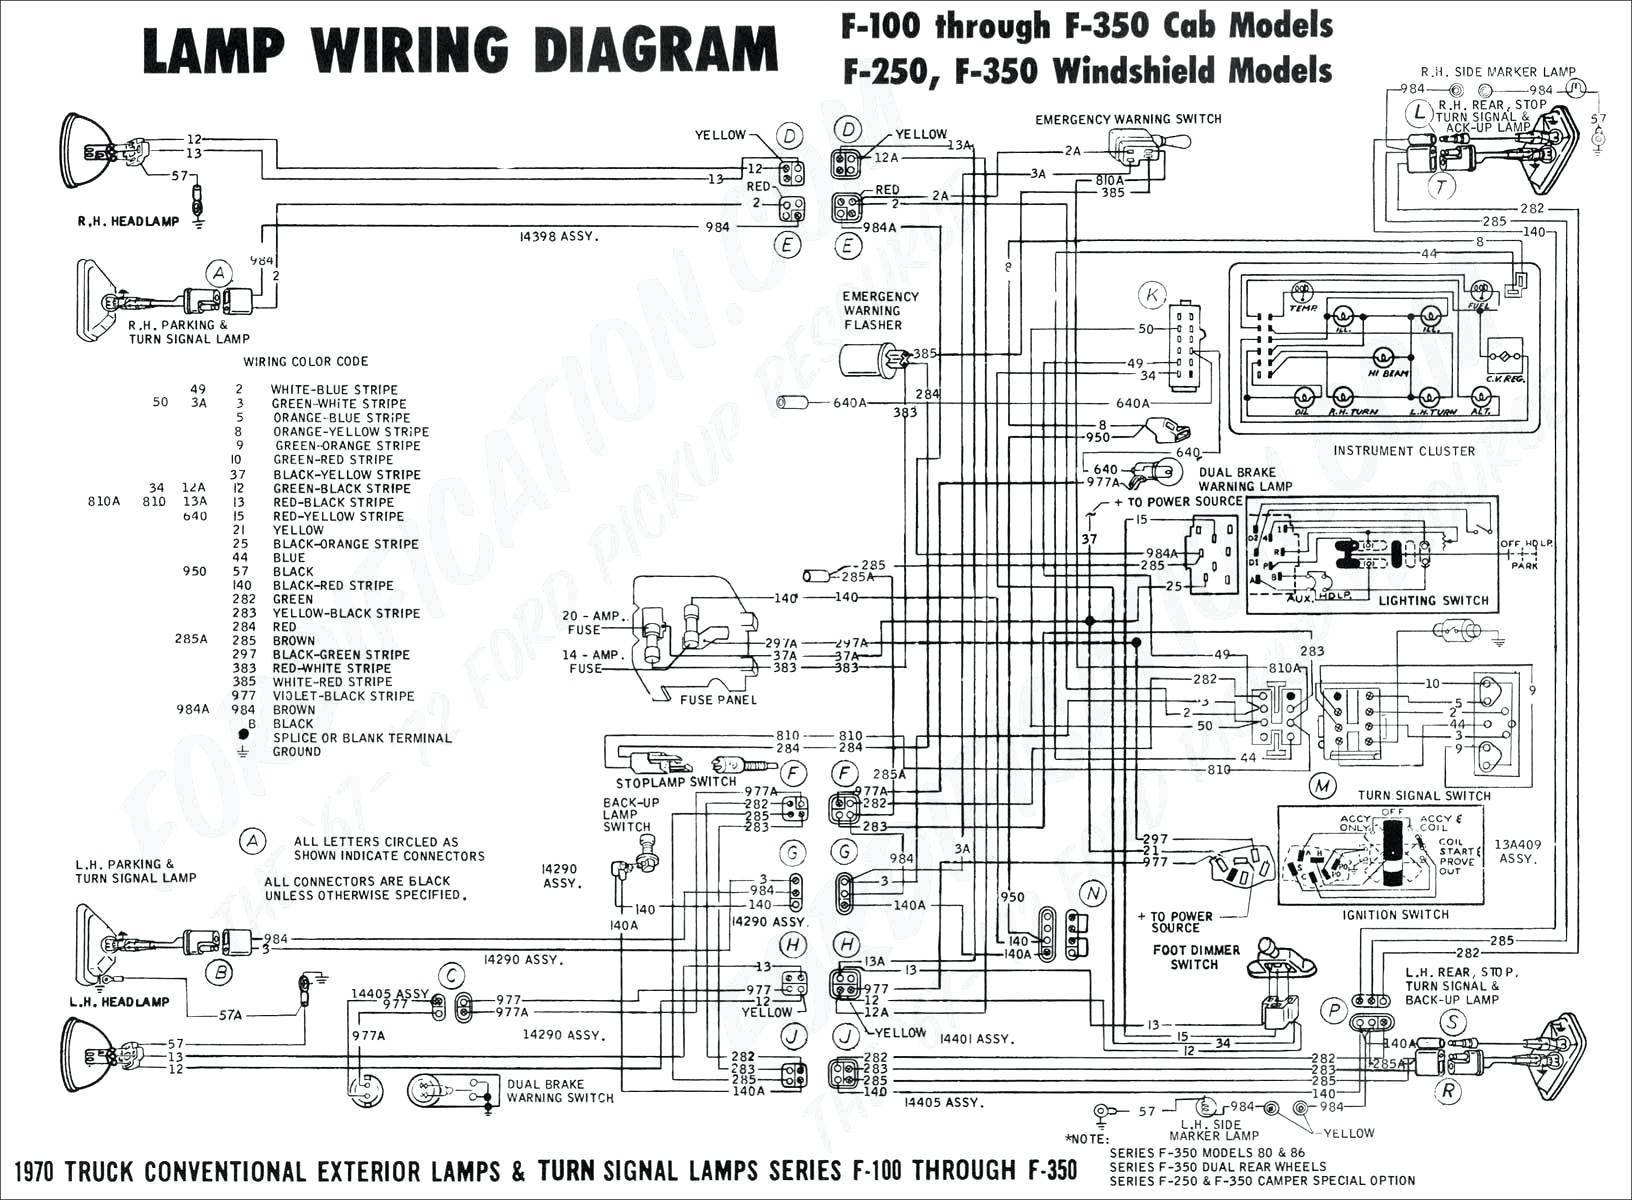 pin wiring diagram for semi truck wiring diagrams